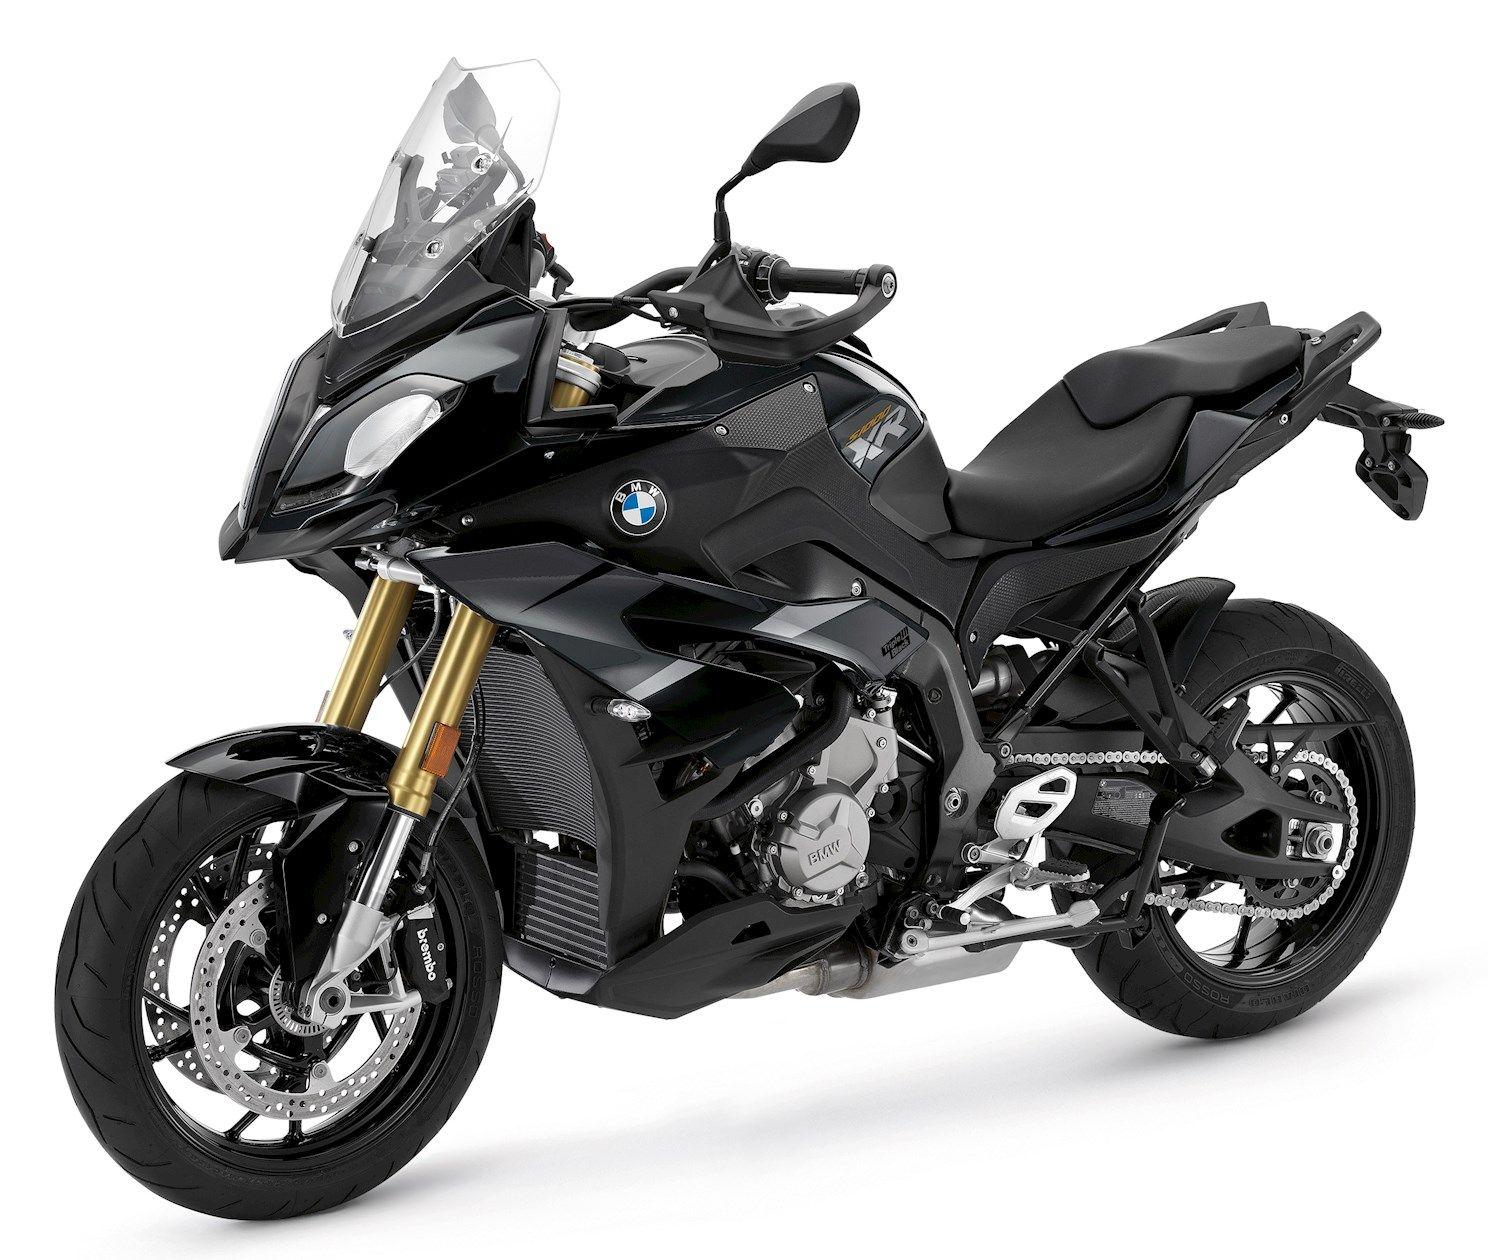 Bmw S1000 Xr Black Motos Esportivas Motos Auto